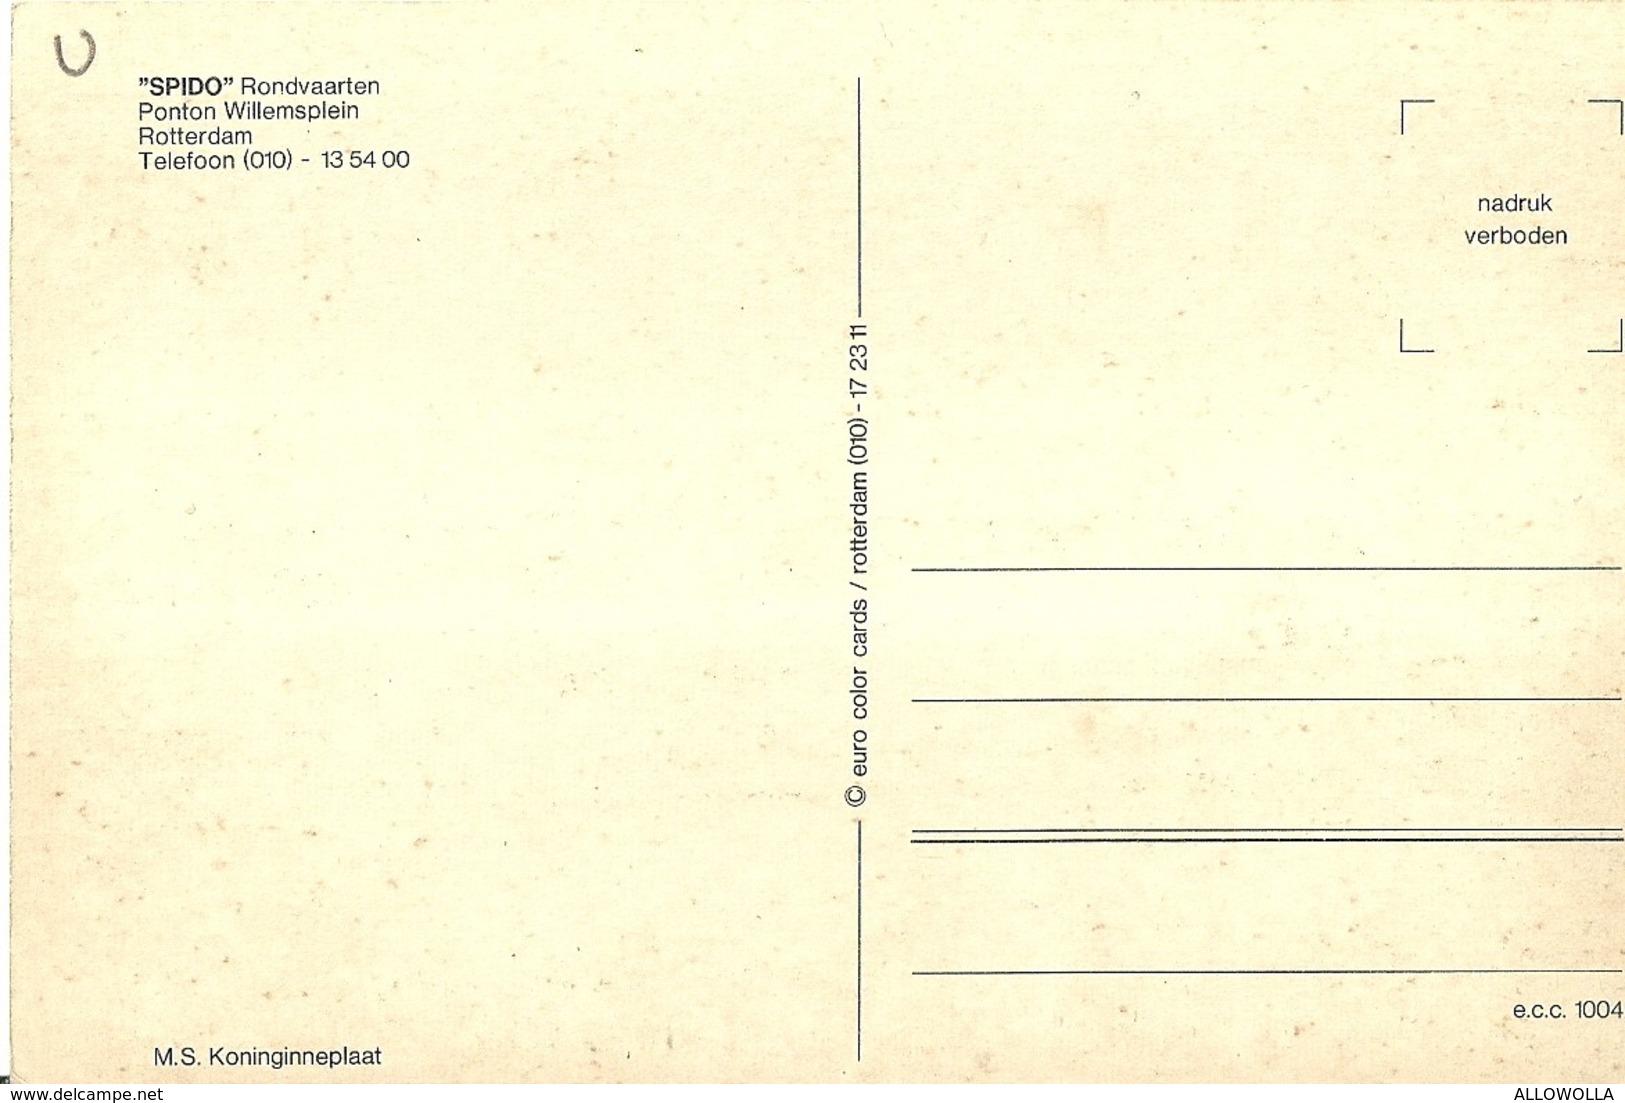 "3436 ""SPIDO-RONDVAARTEN-PONTON WILLEMSPLEIN-ROTTERDAM-M.S. KONINGINNEPLAAT""ANIMATA- CART. ILL.POST. ORIG. NON SPED. - Altri"